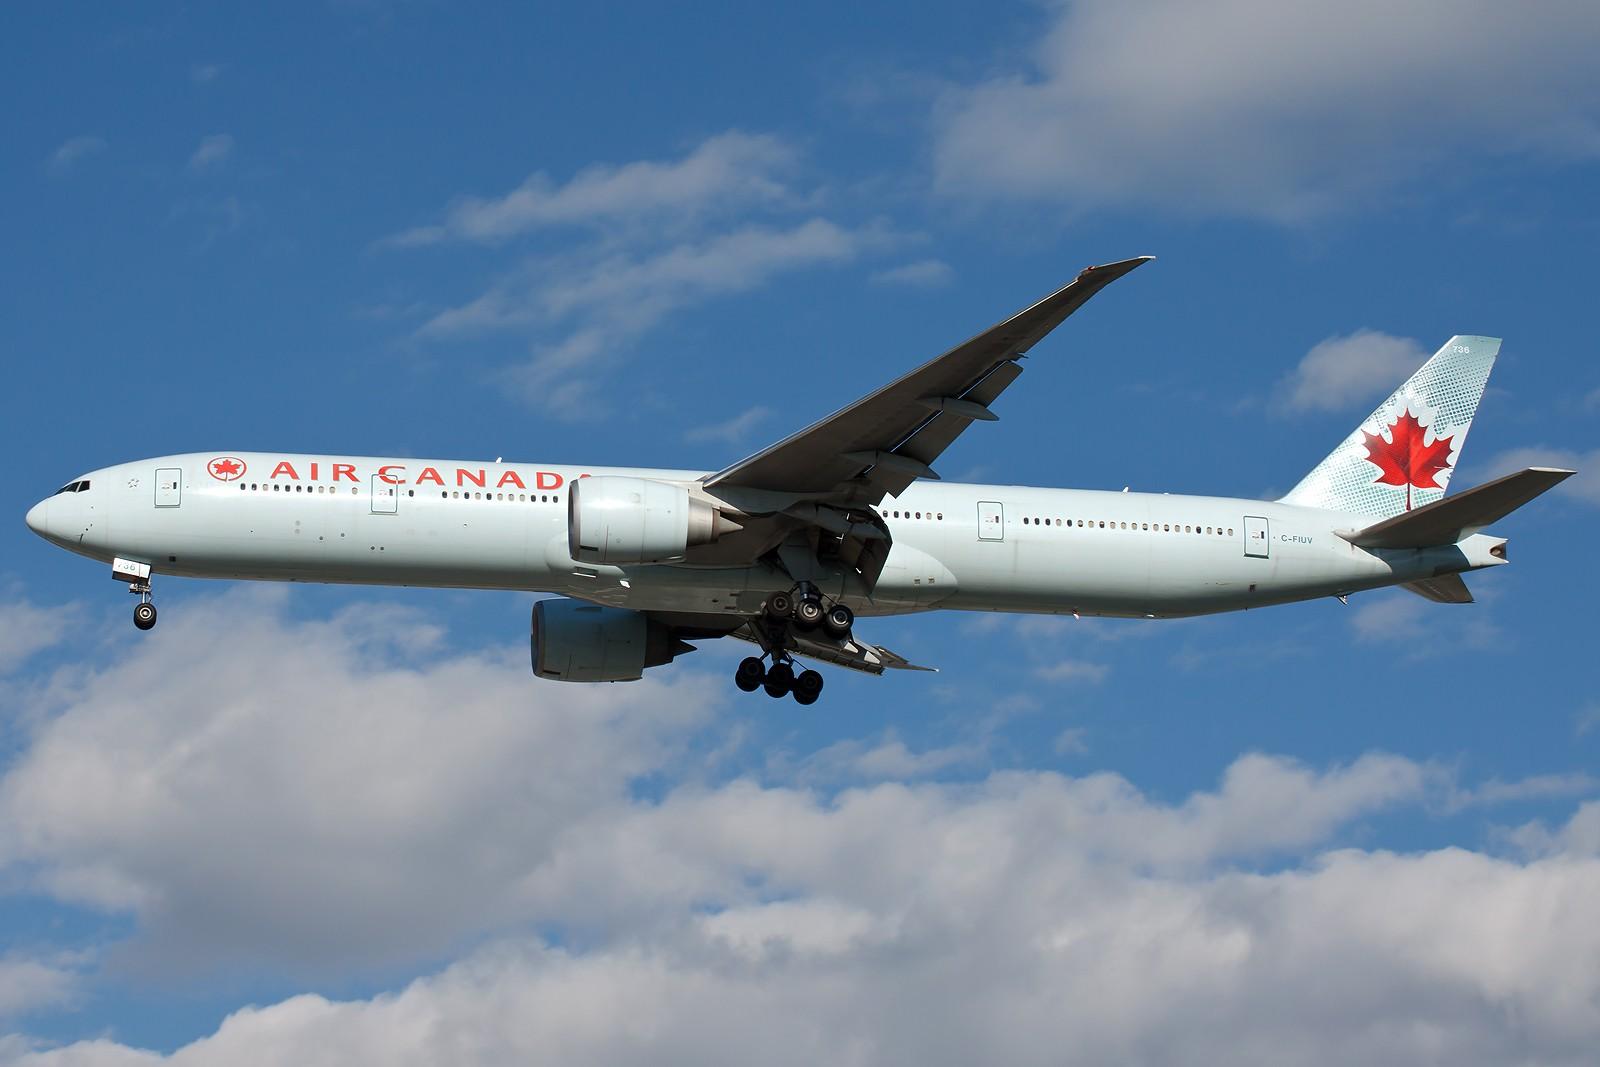 Re:[原创]求好天儿... [10pics] BOEING 777-300ER C-FIUV 中国北京首都国际机场